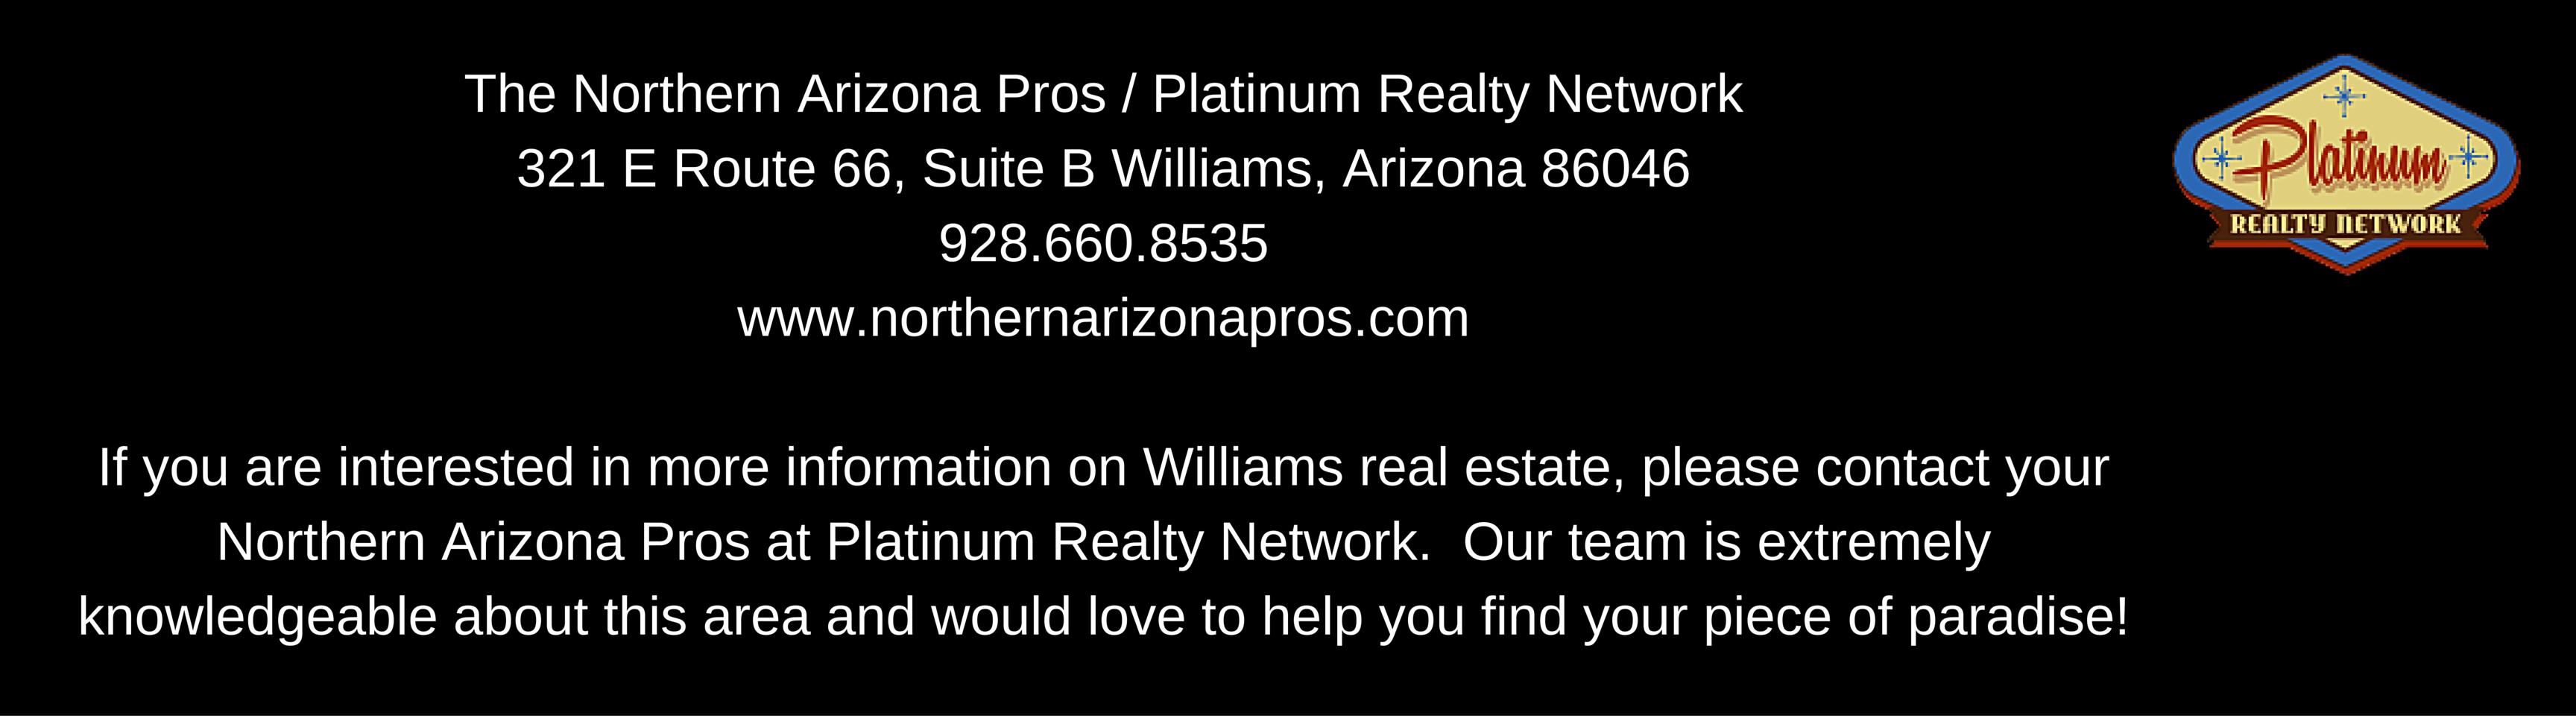 Williams Arizona Real Estate Agents